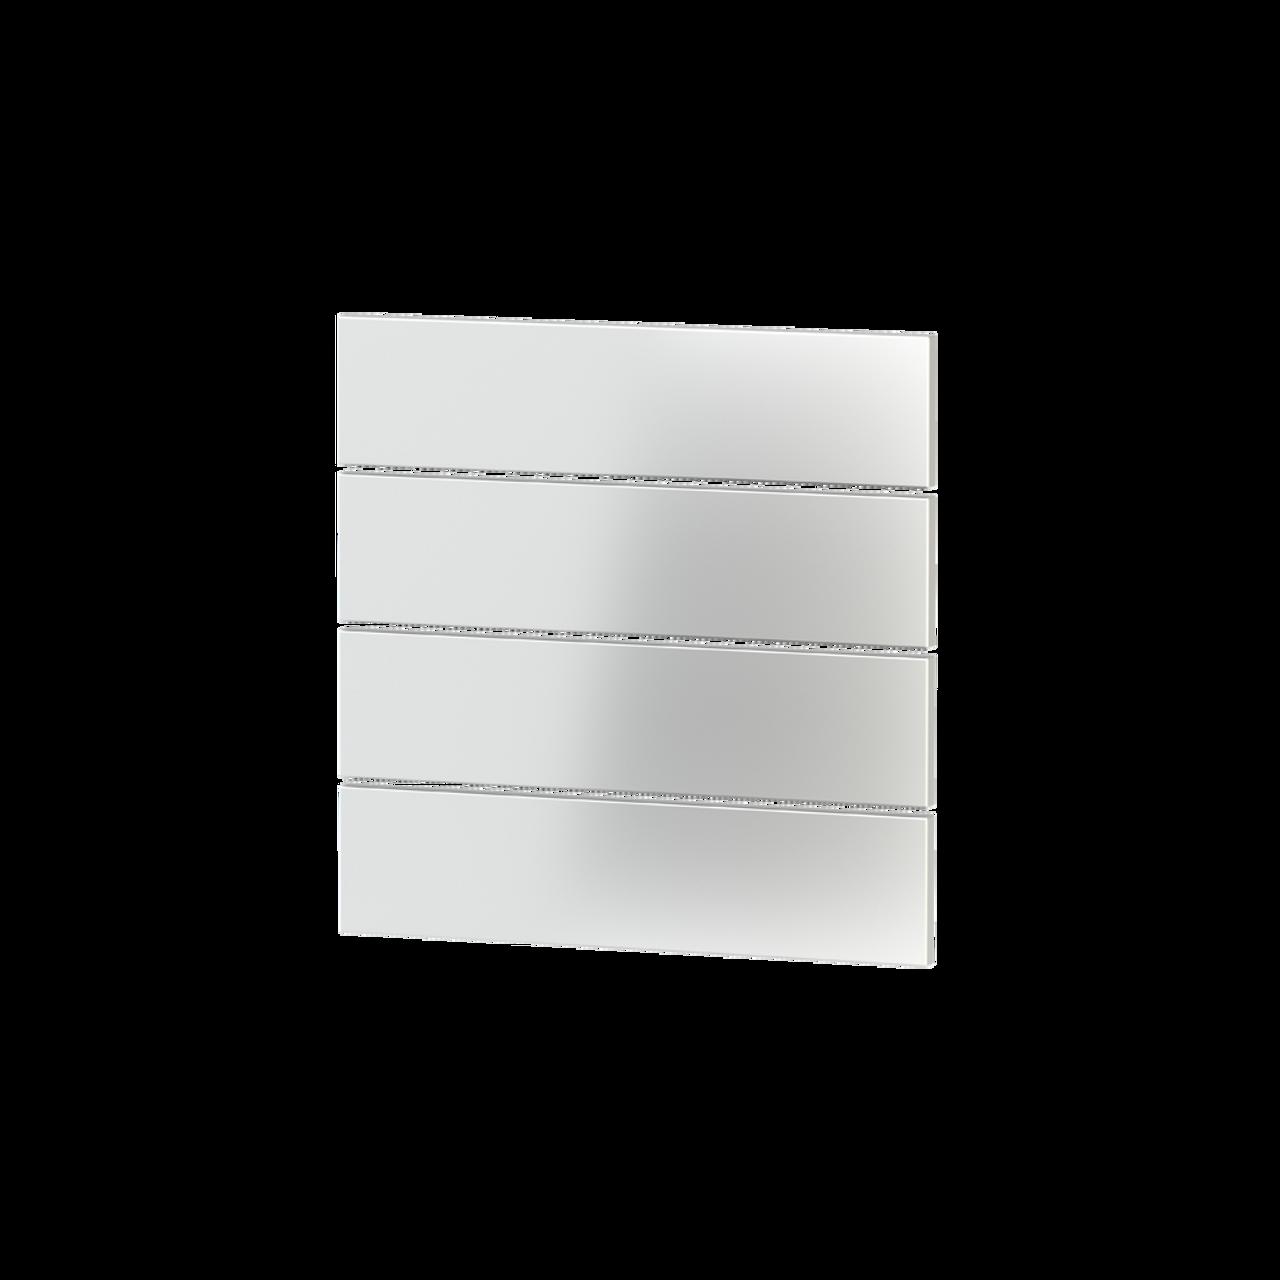 Rectangular horizontal plastic rocker (4 pcs.) - for 4-fold pushbutton FF series